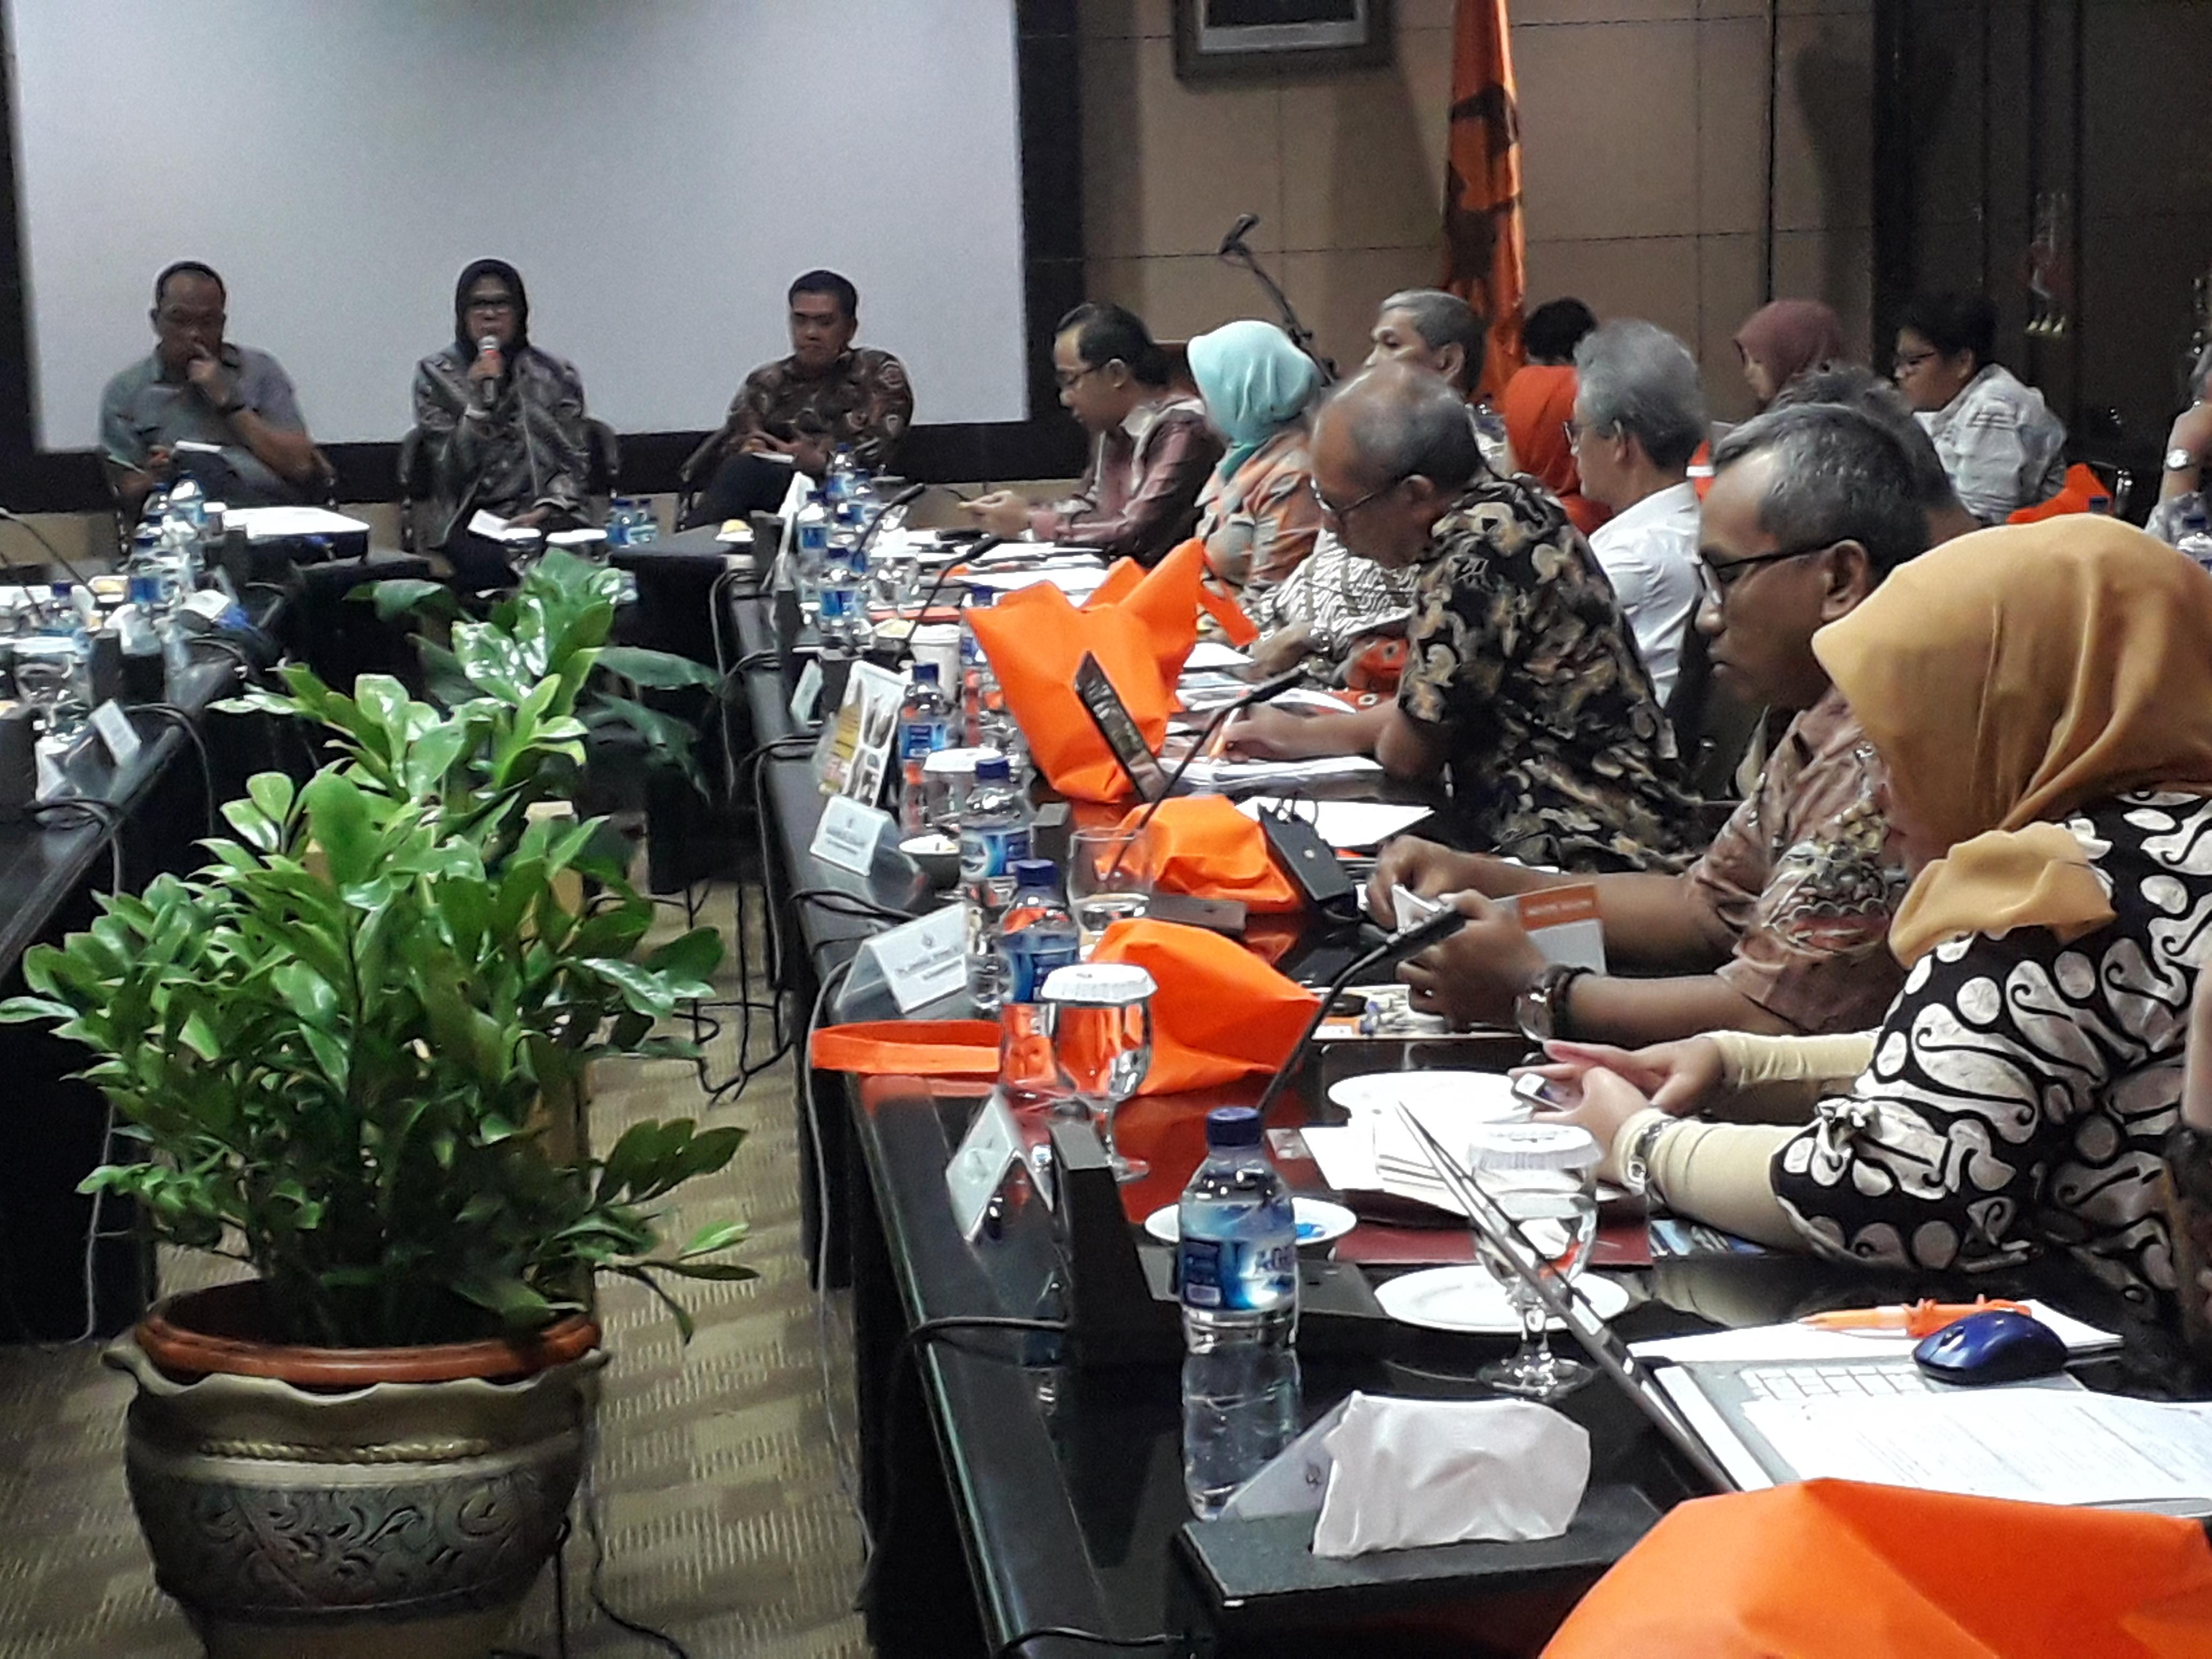 Kembangankan Ekowisata Kawasan Siberut Mentawai, STP Trisakti Bersama TFCA Gelar FGD